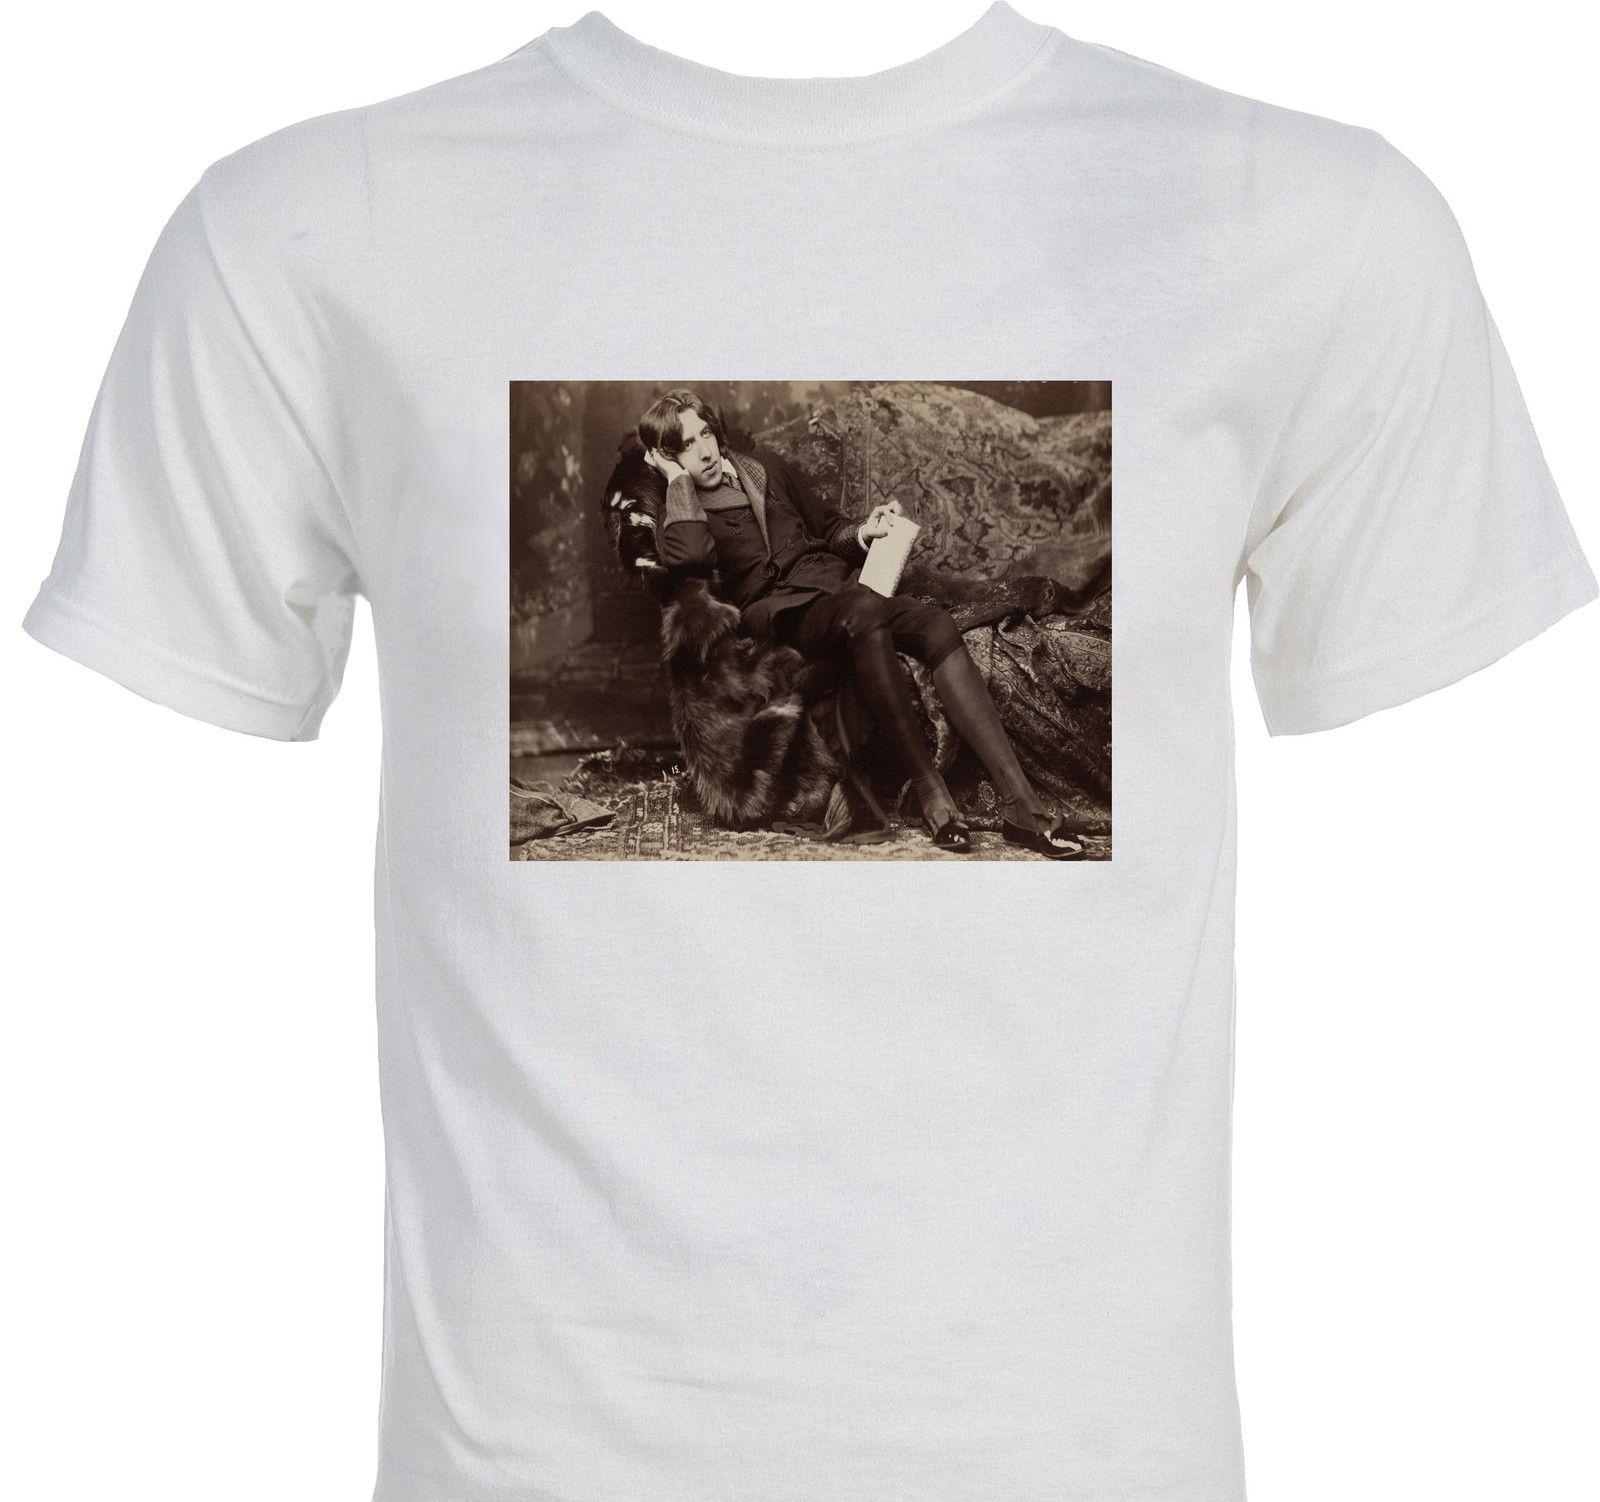 Men Good Quality T-Shirt Top Tees Fashion Cotton Casual Free Shipping Oscar Wilde Classic Literature Dorian Gray T Shirt Creator